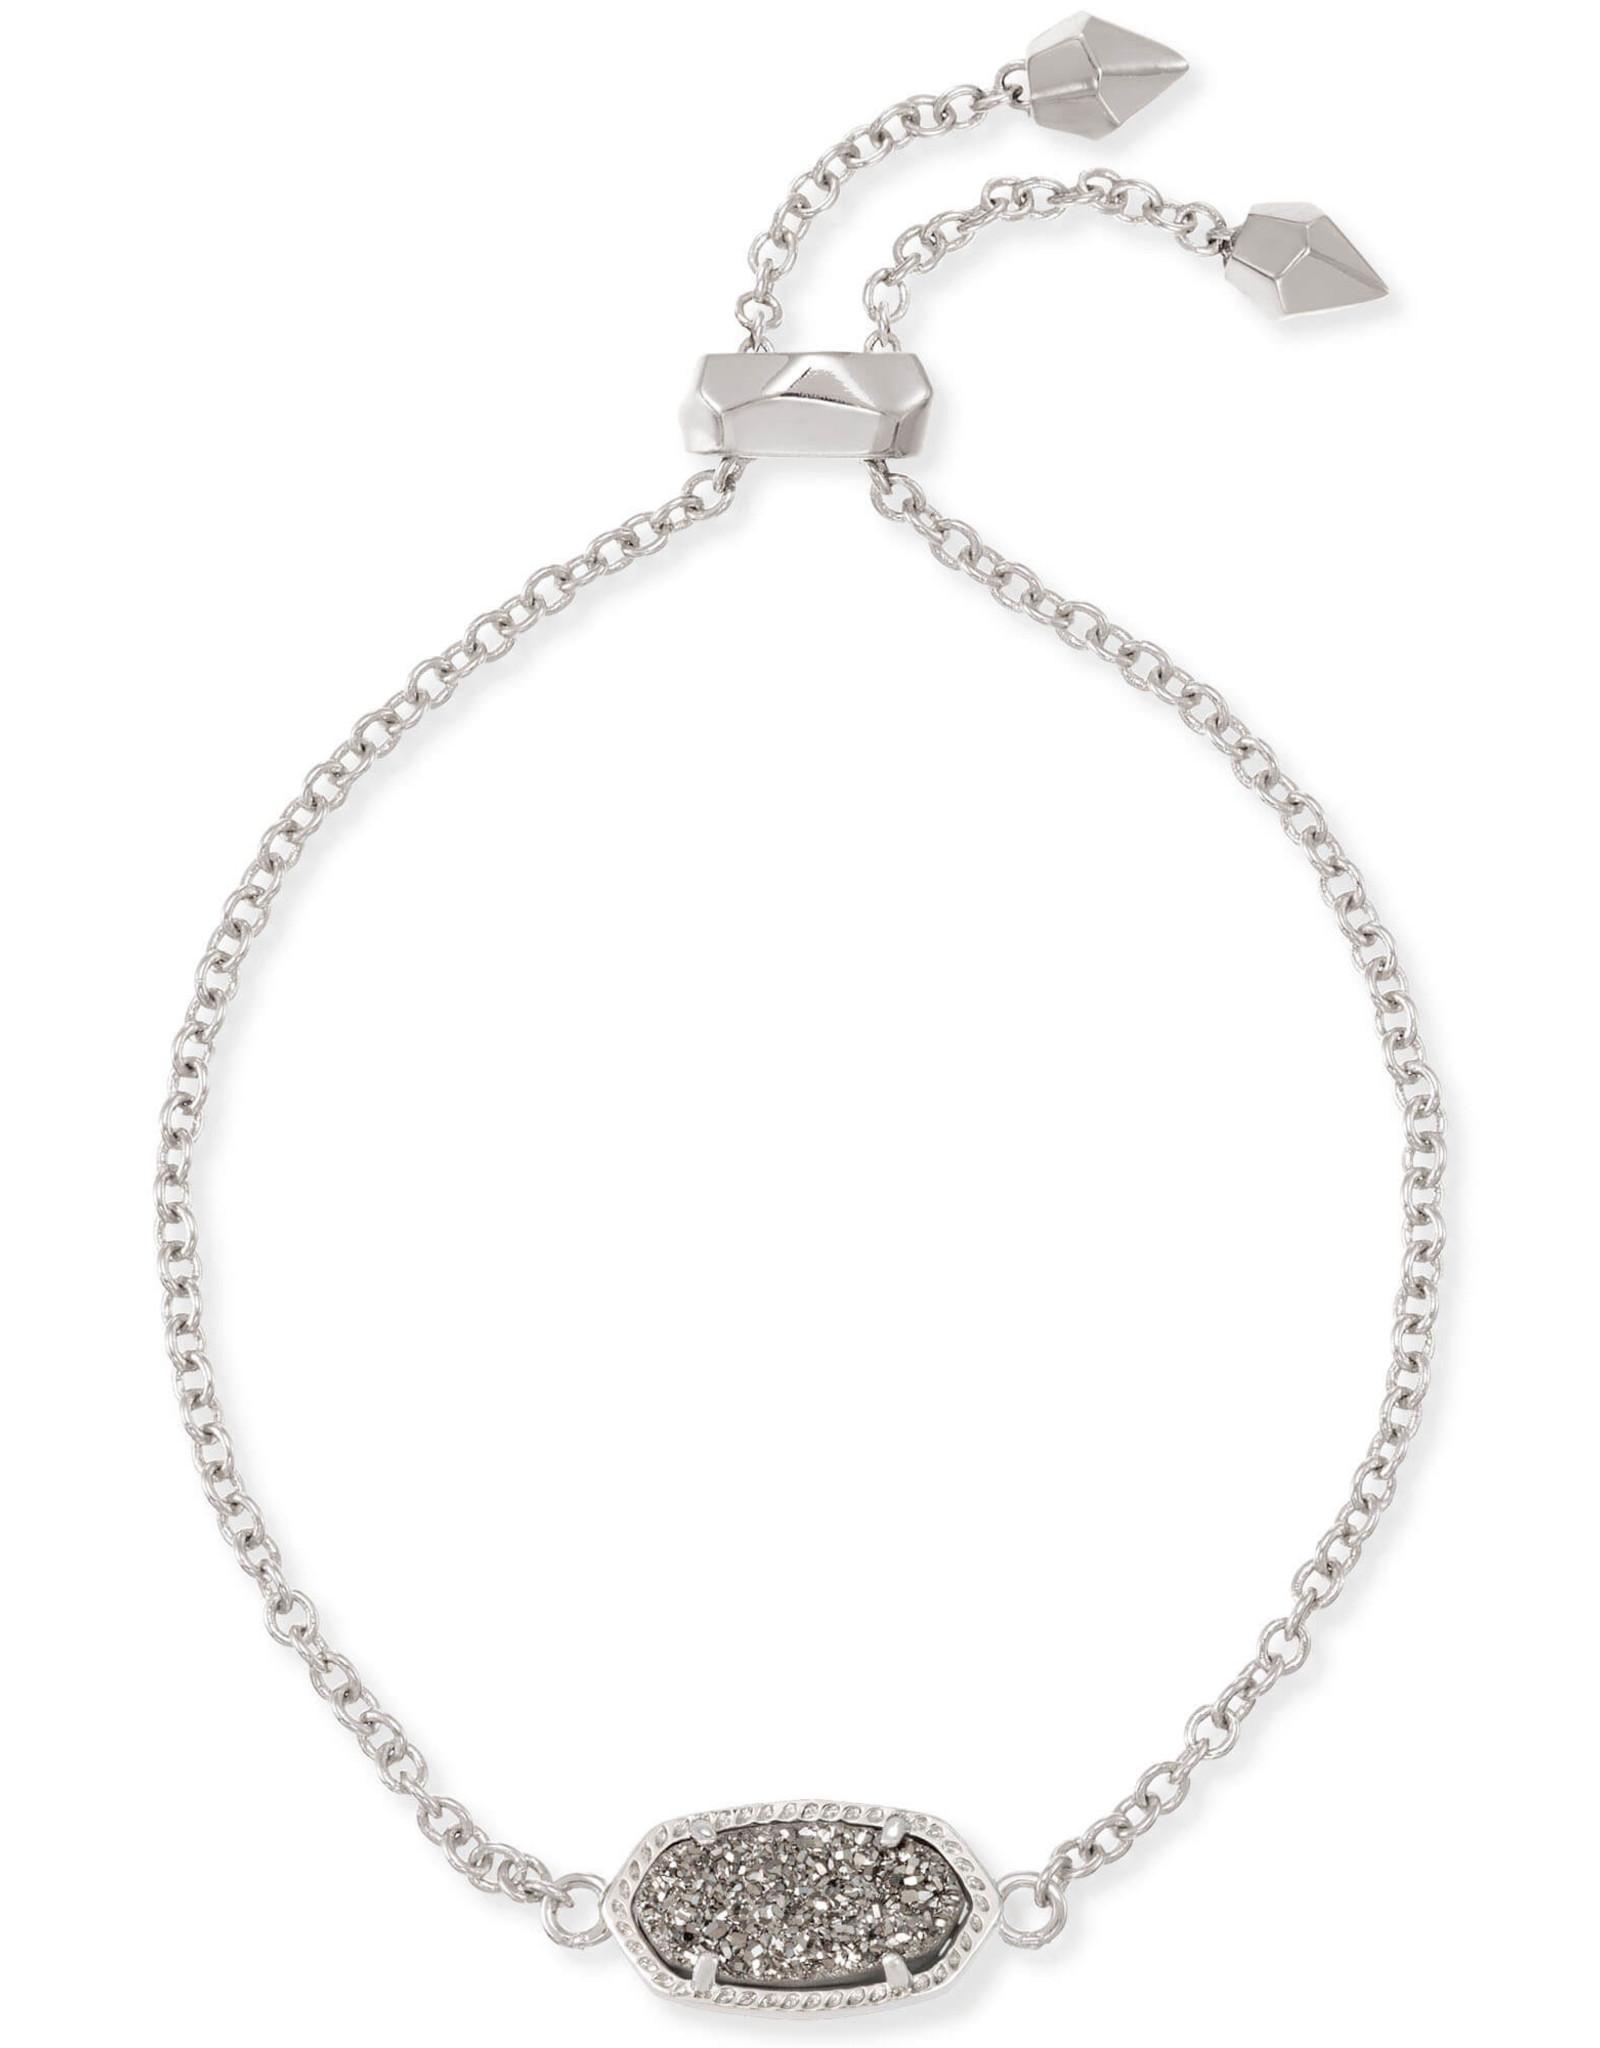 Kendra Scott Elaina Bracelet - Platinum Drusy/Rhodium